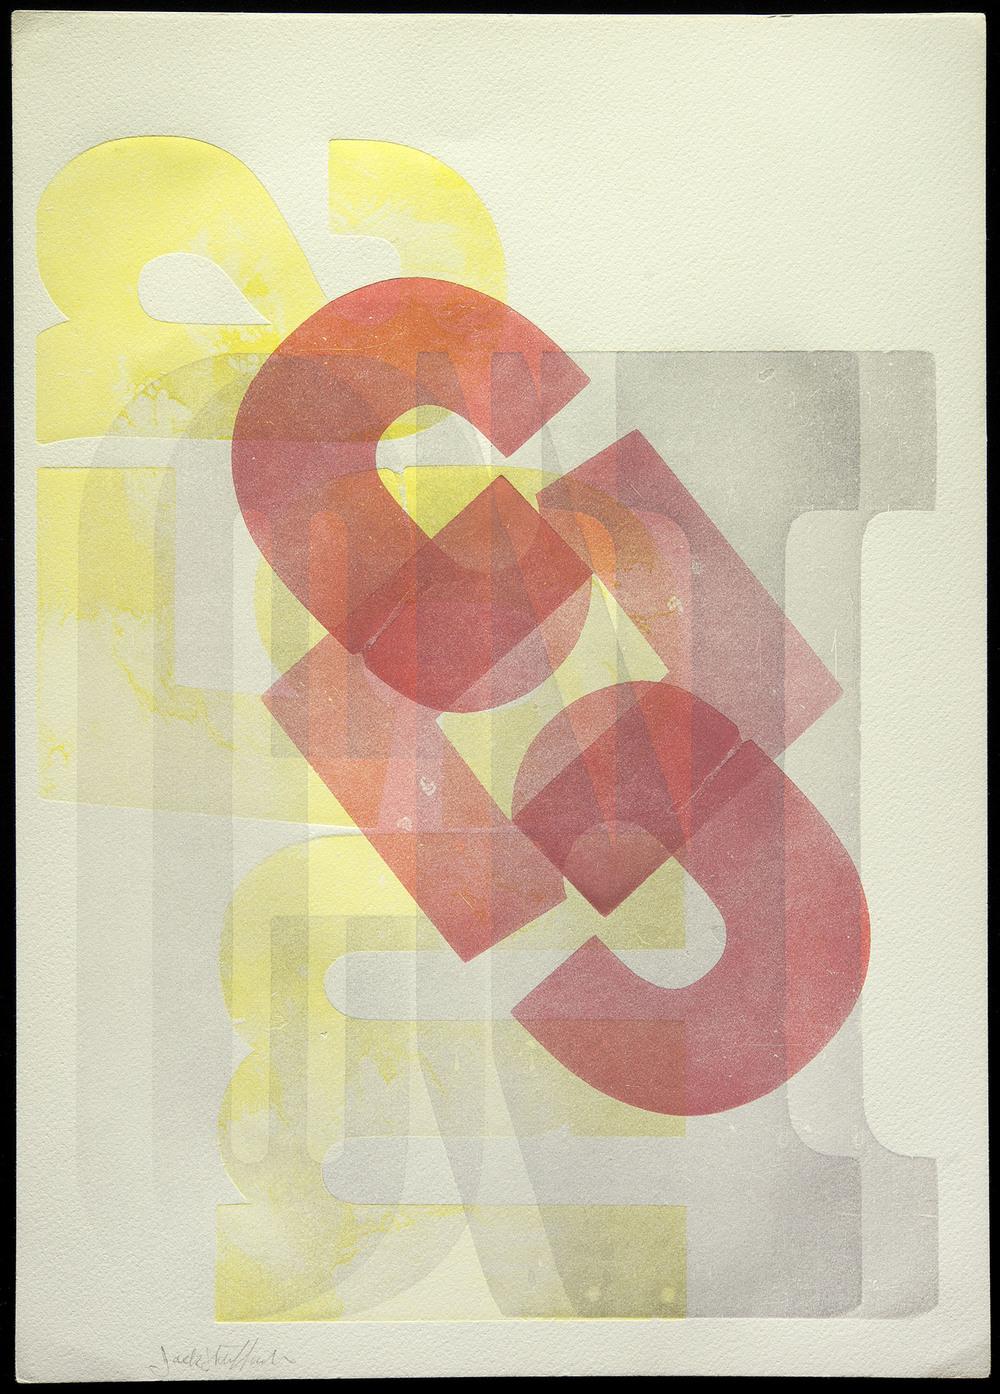 Jack Stauffacher, wood type print, San Francisco, no date, 25.4 x 35.5 cm